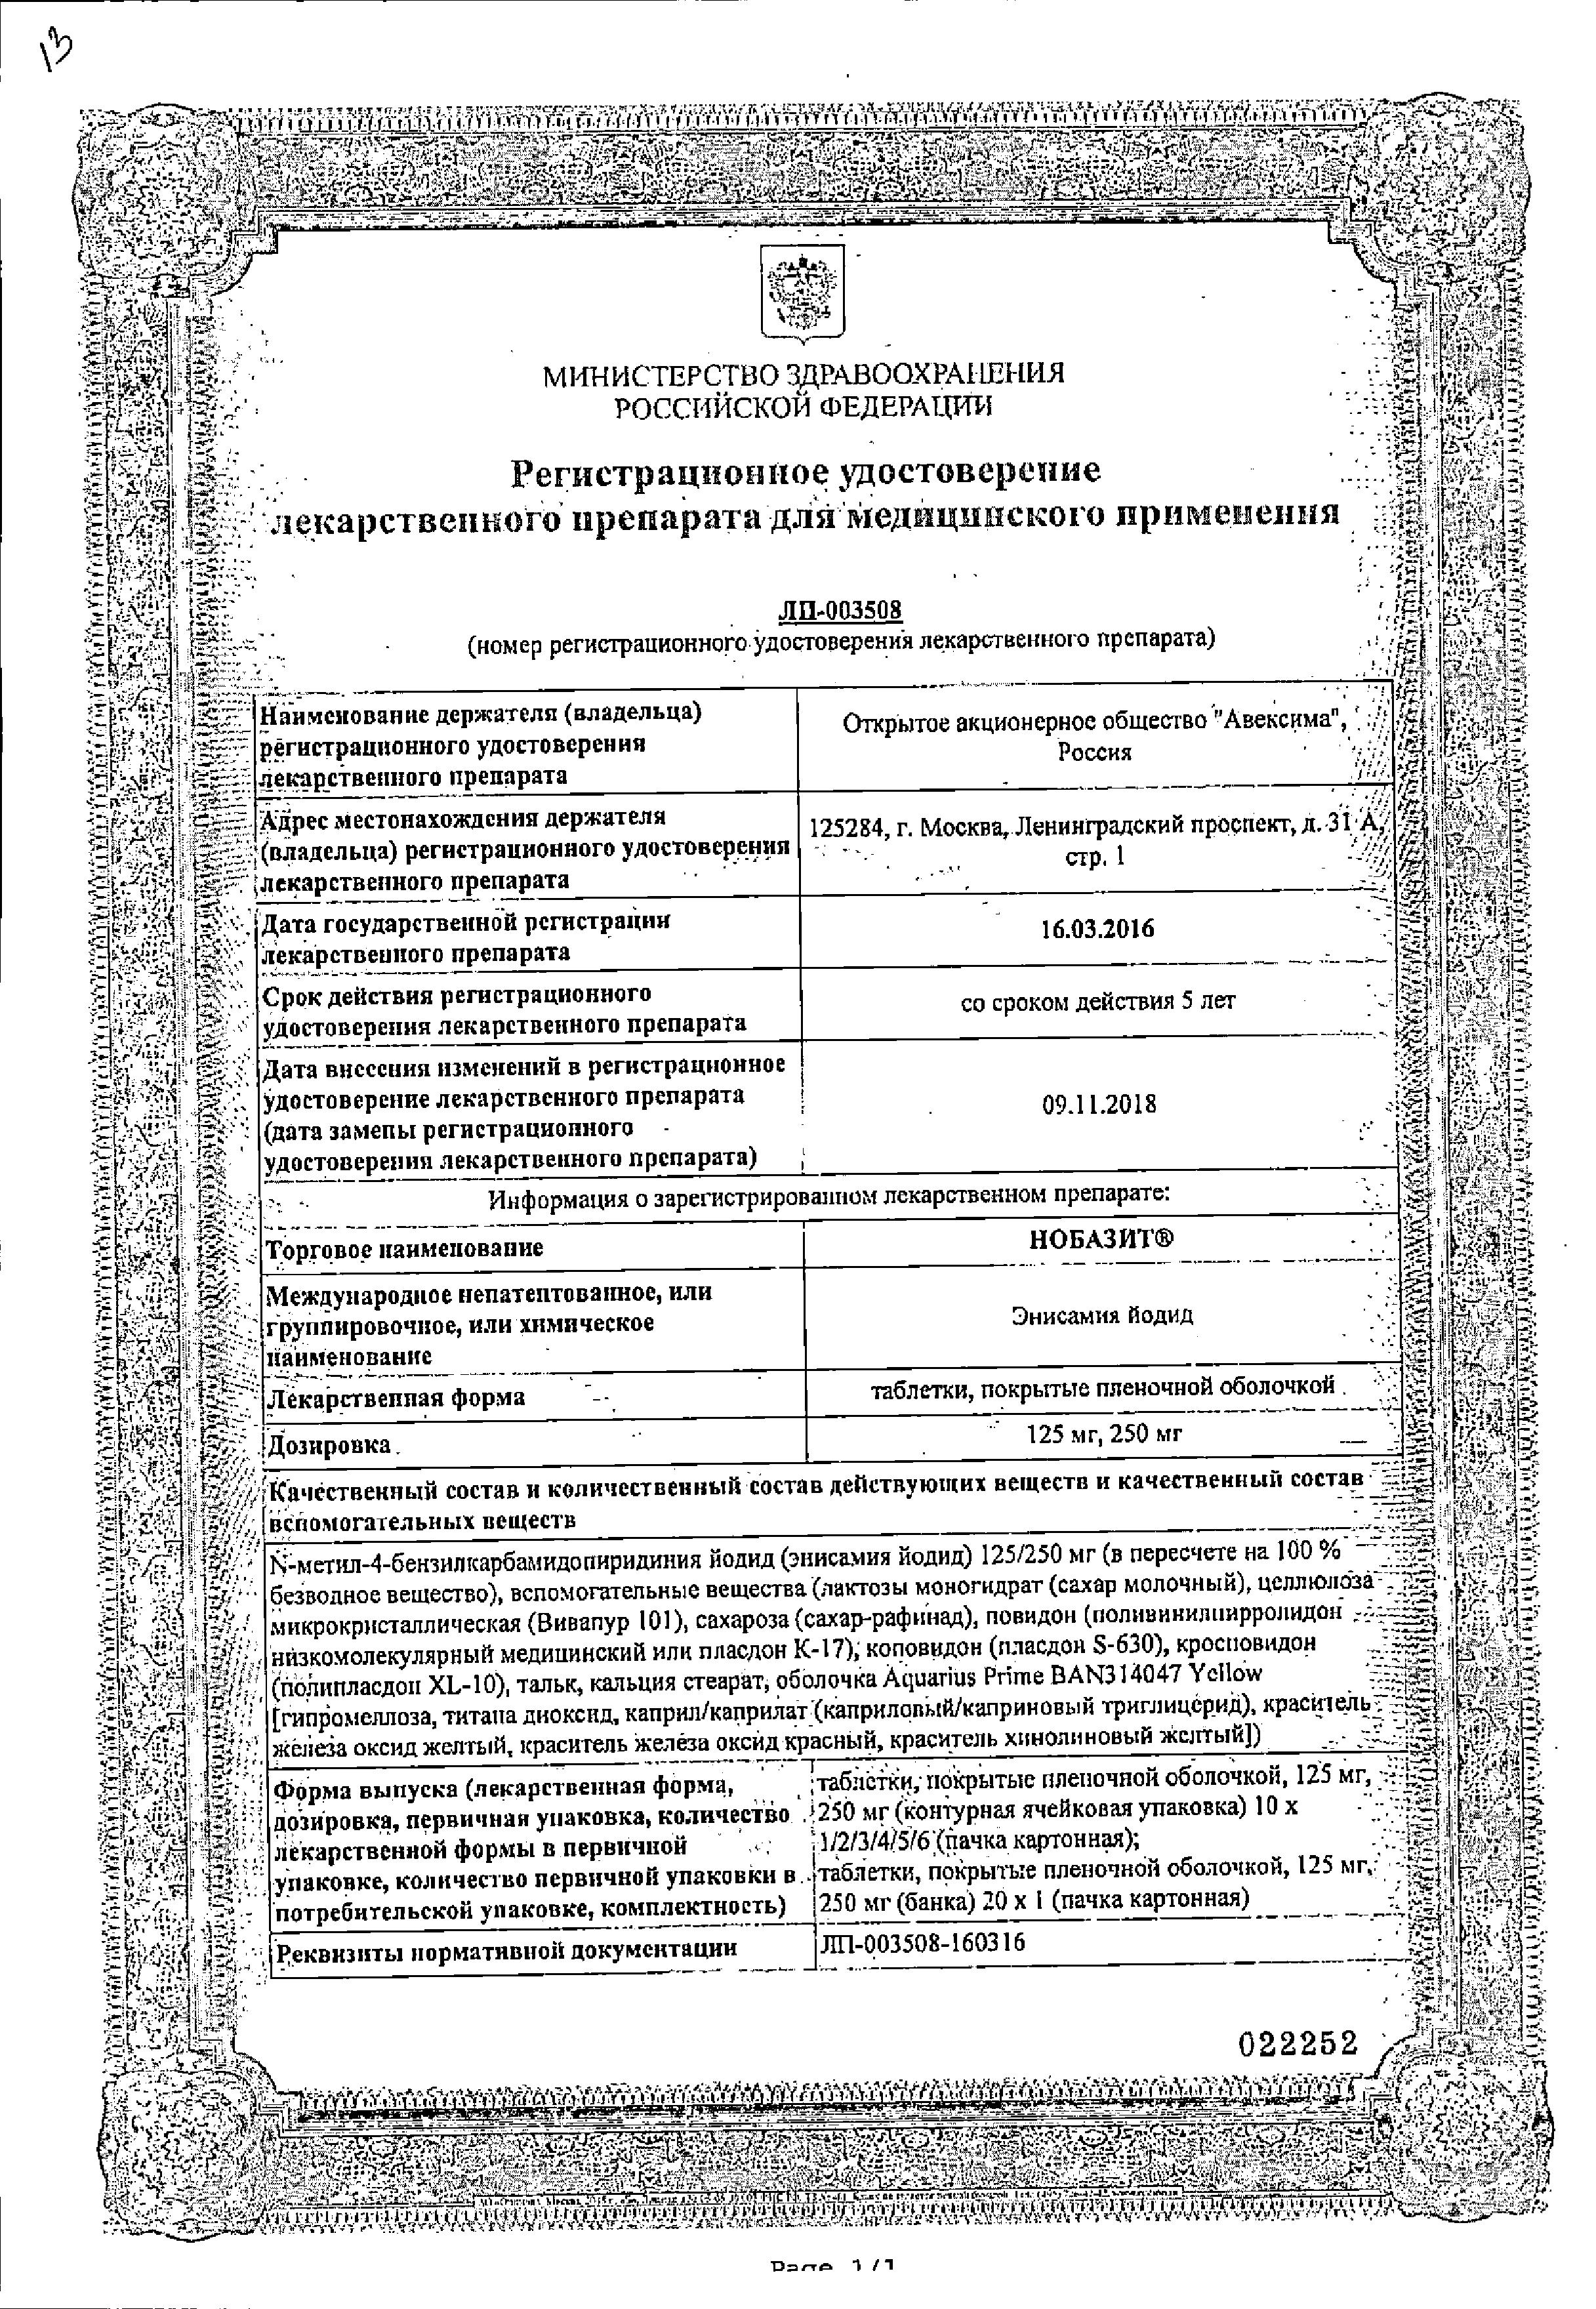 Нобазит сертификат